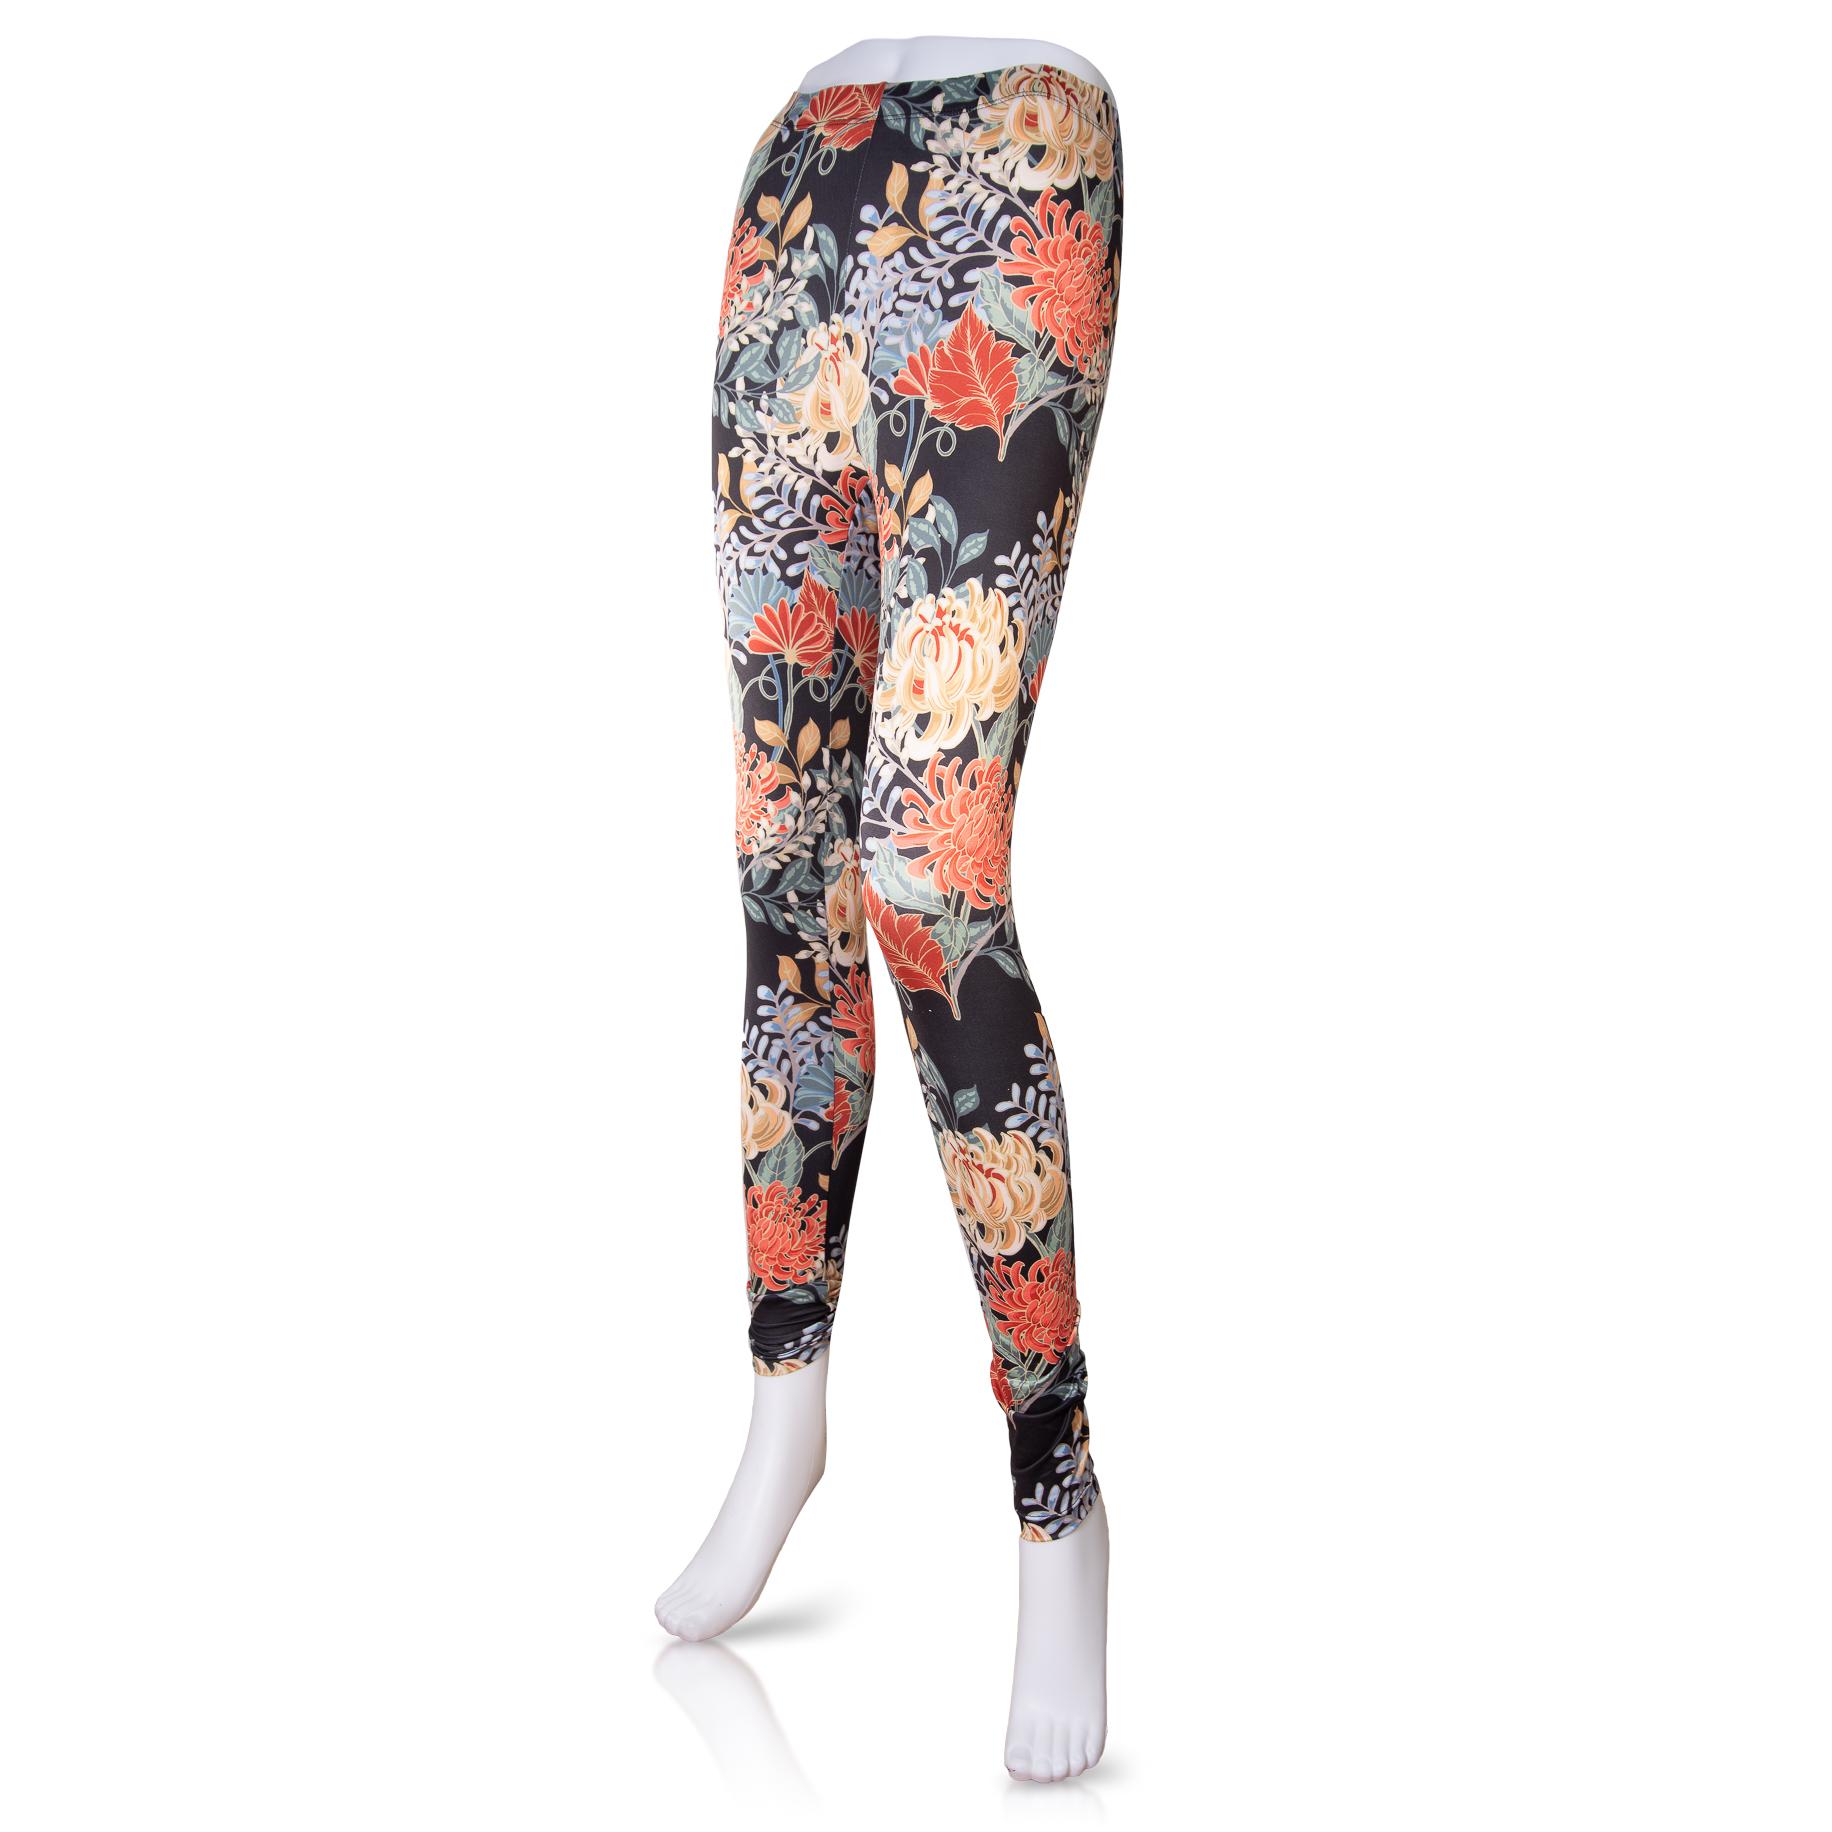 Mums in tights Fashion Leggings Mums Amanda Blu And Company